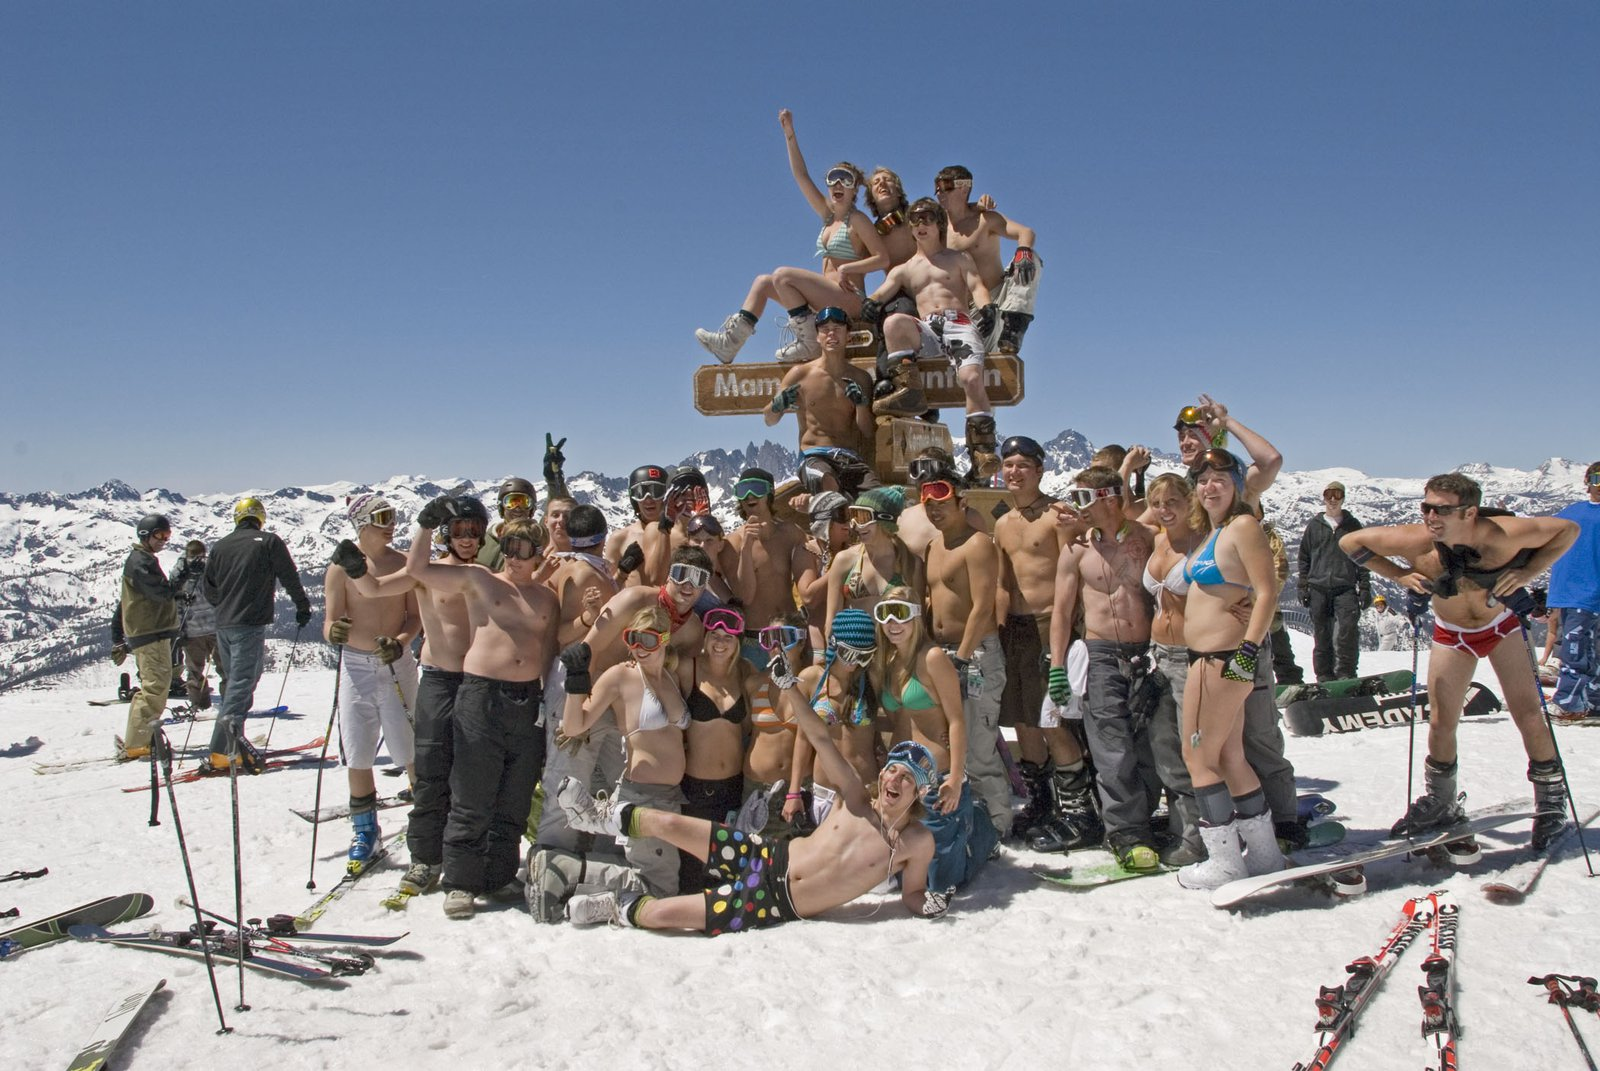 Peak of Mammoth Mountain